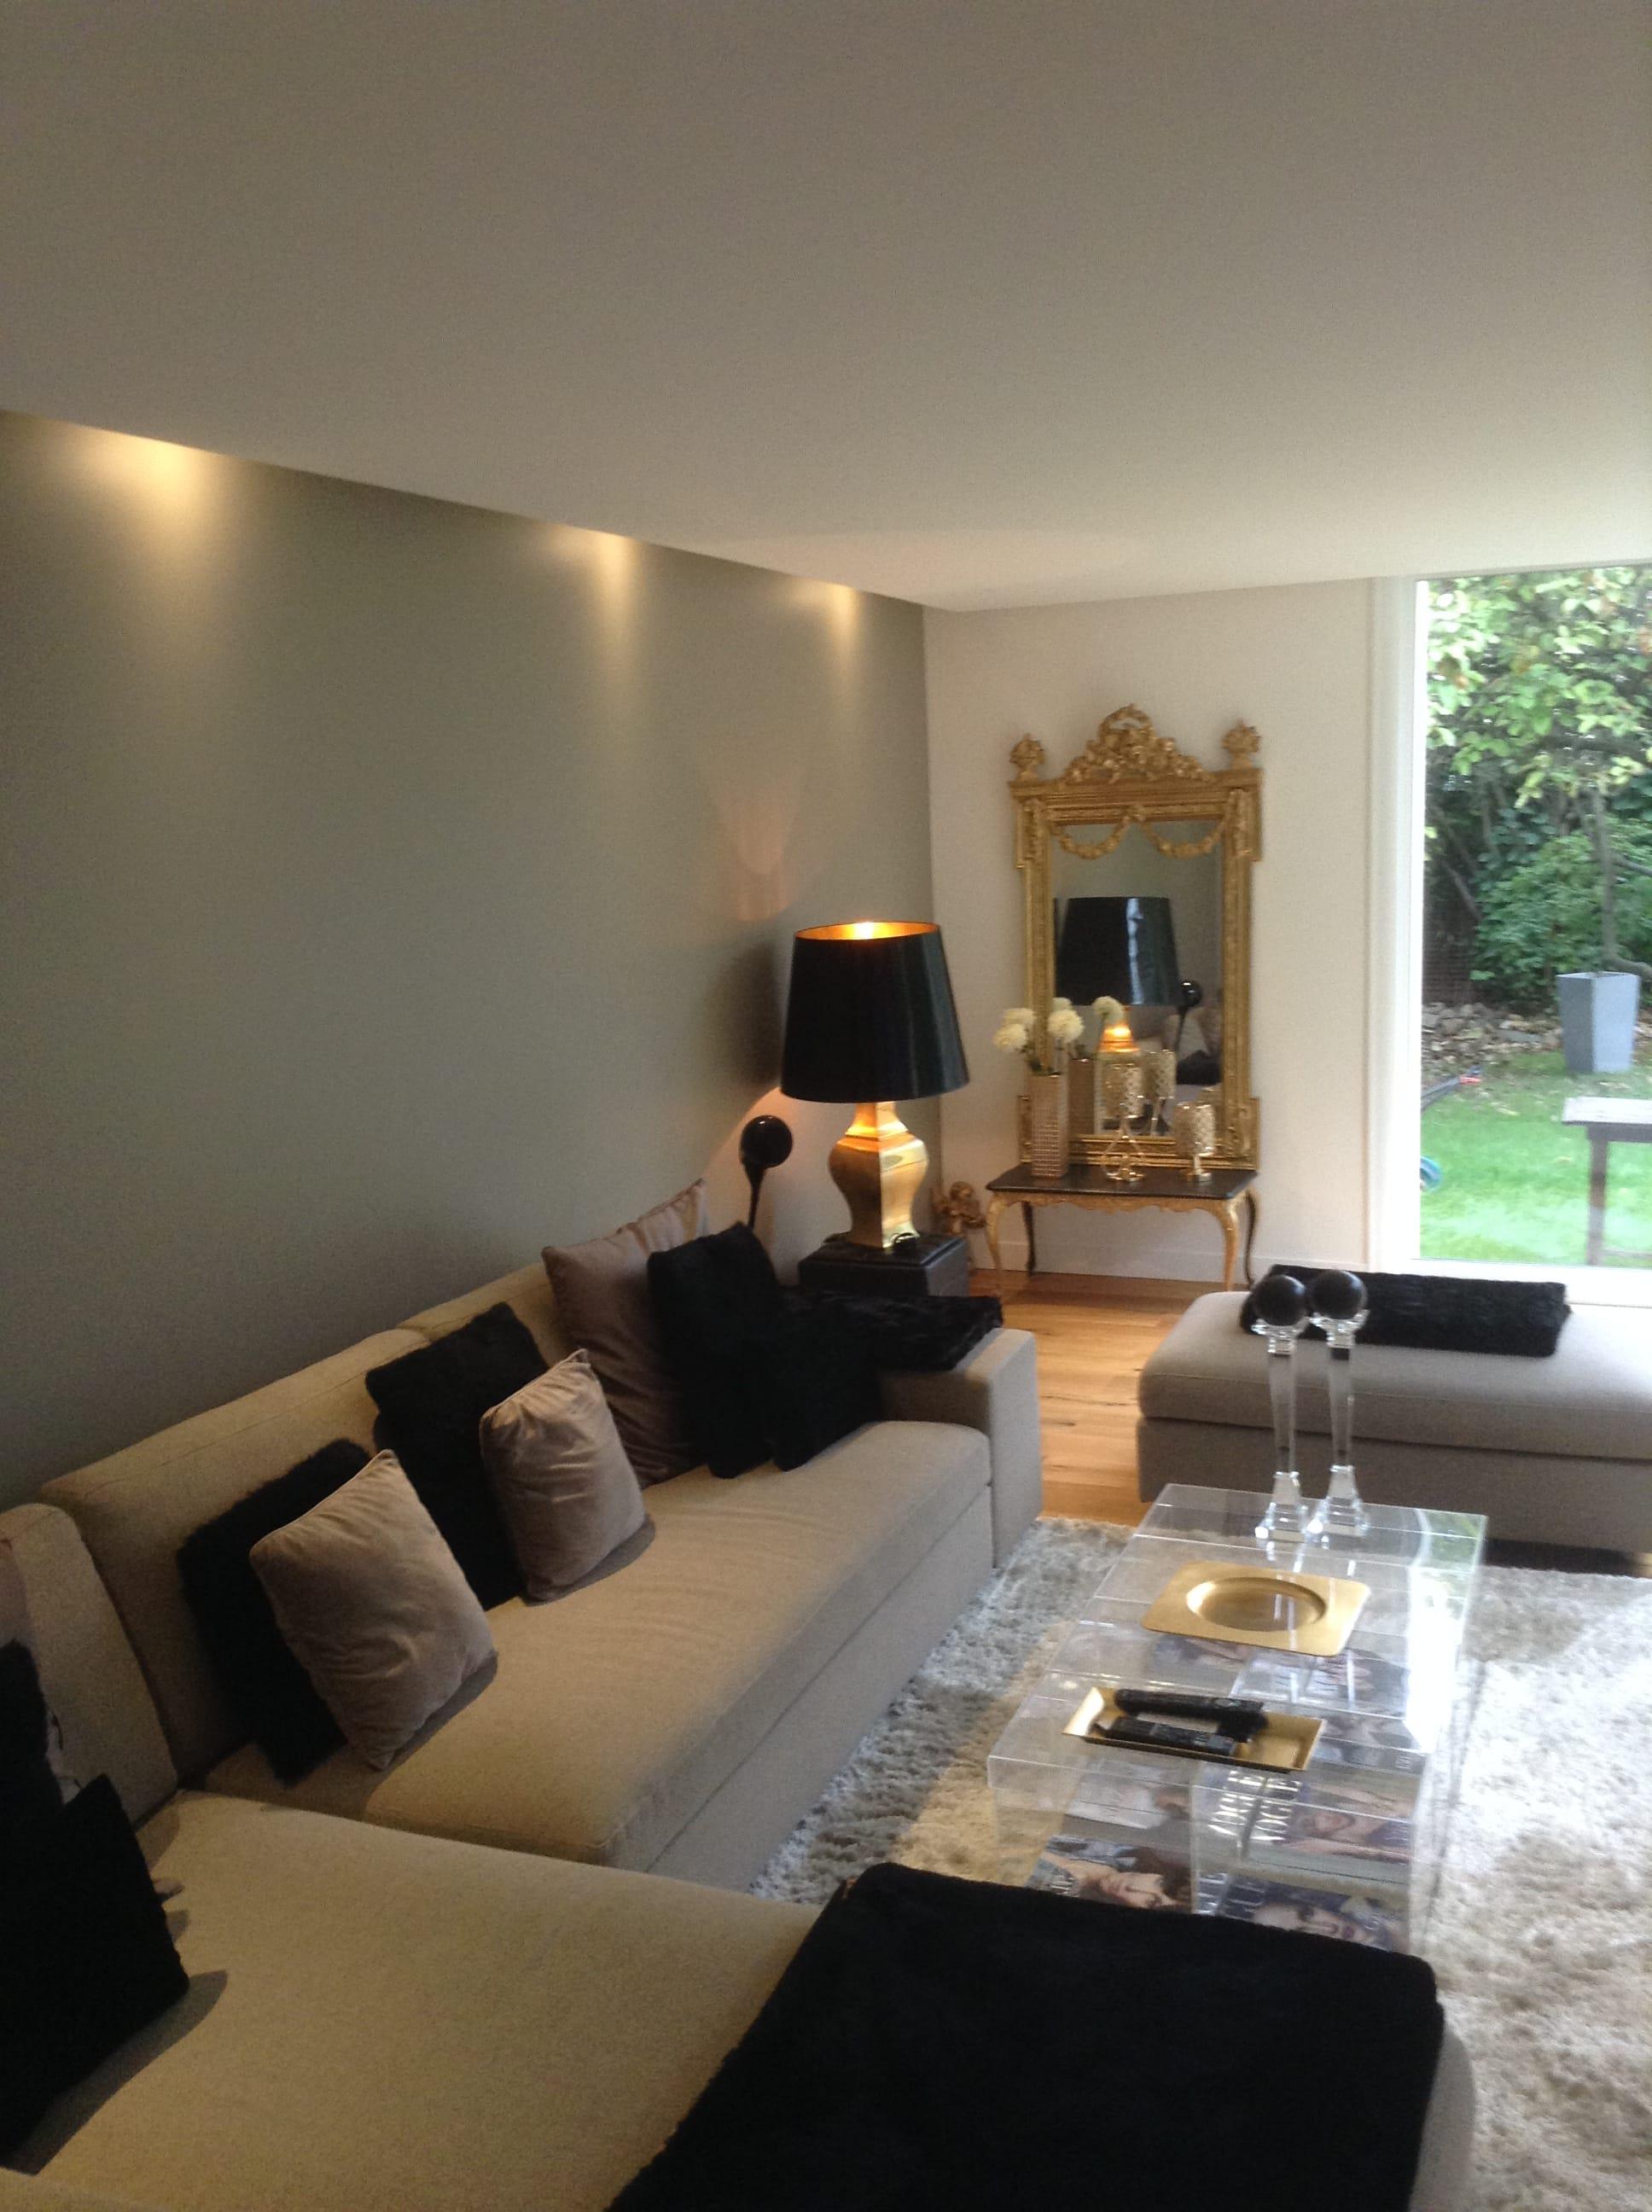 mur kaki et gris. Black Bedroom Furniture Sets. Home Design Ideas